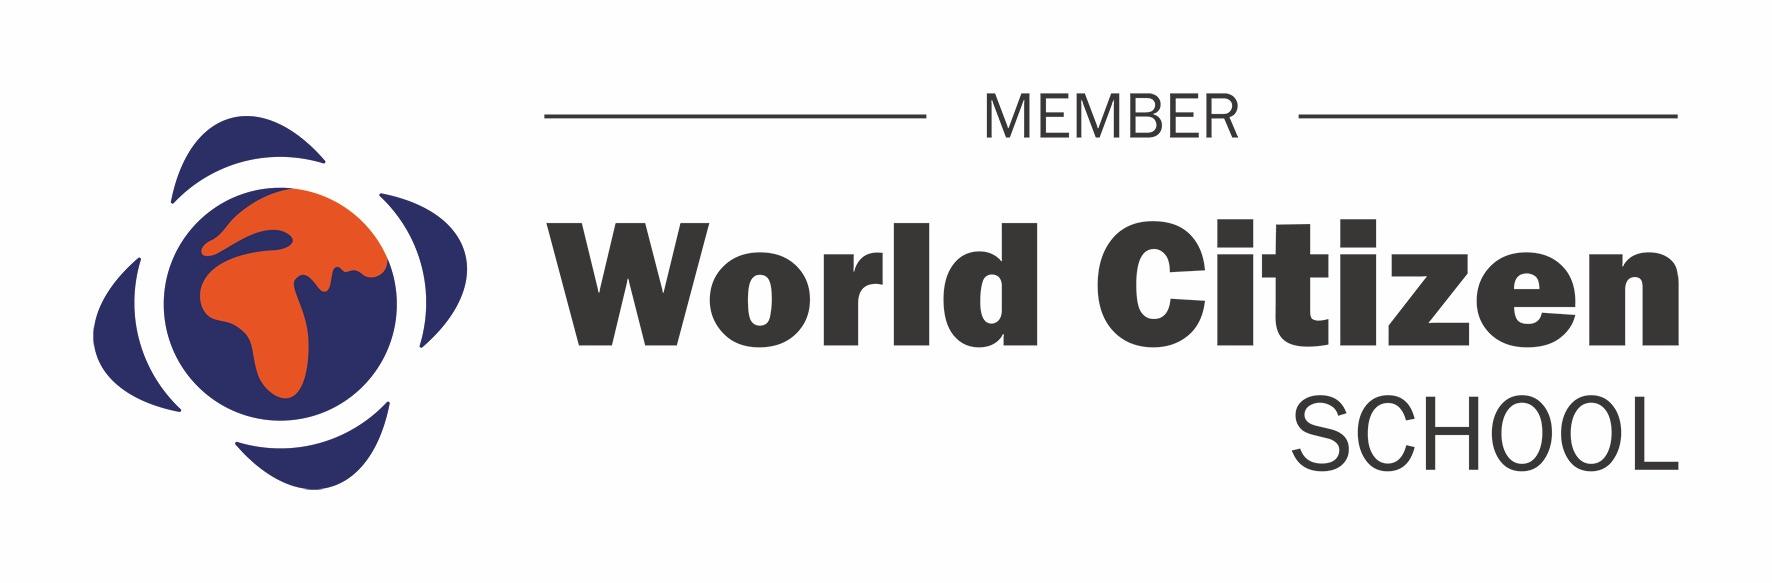 WCS_Mitgliedslogo_4C.jpg